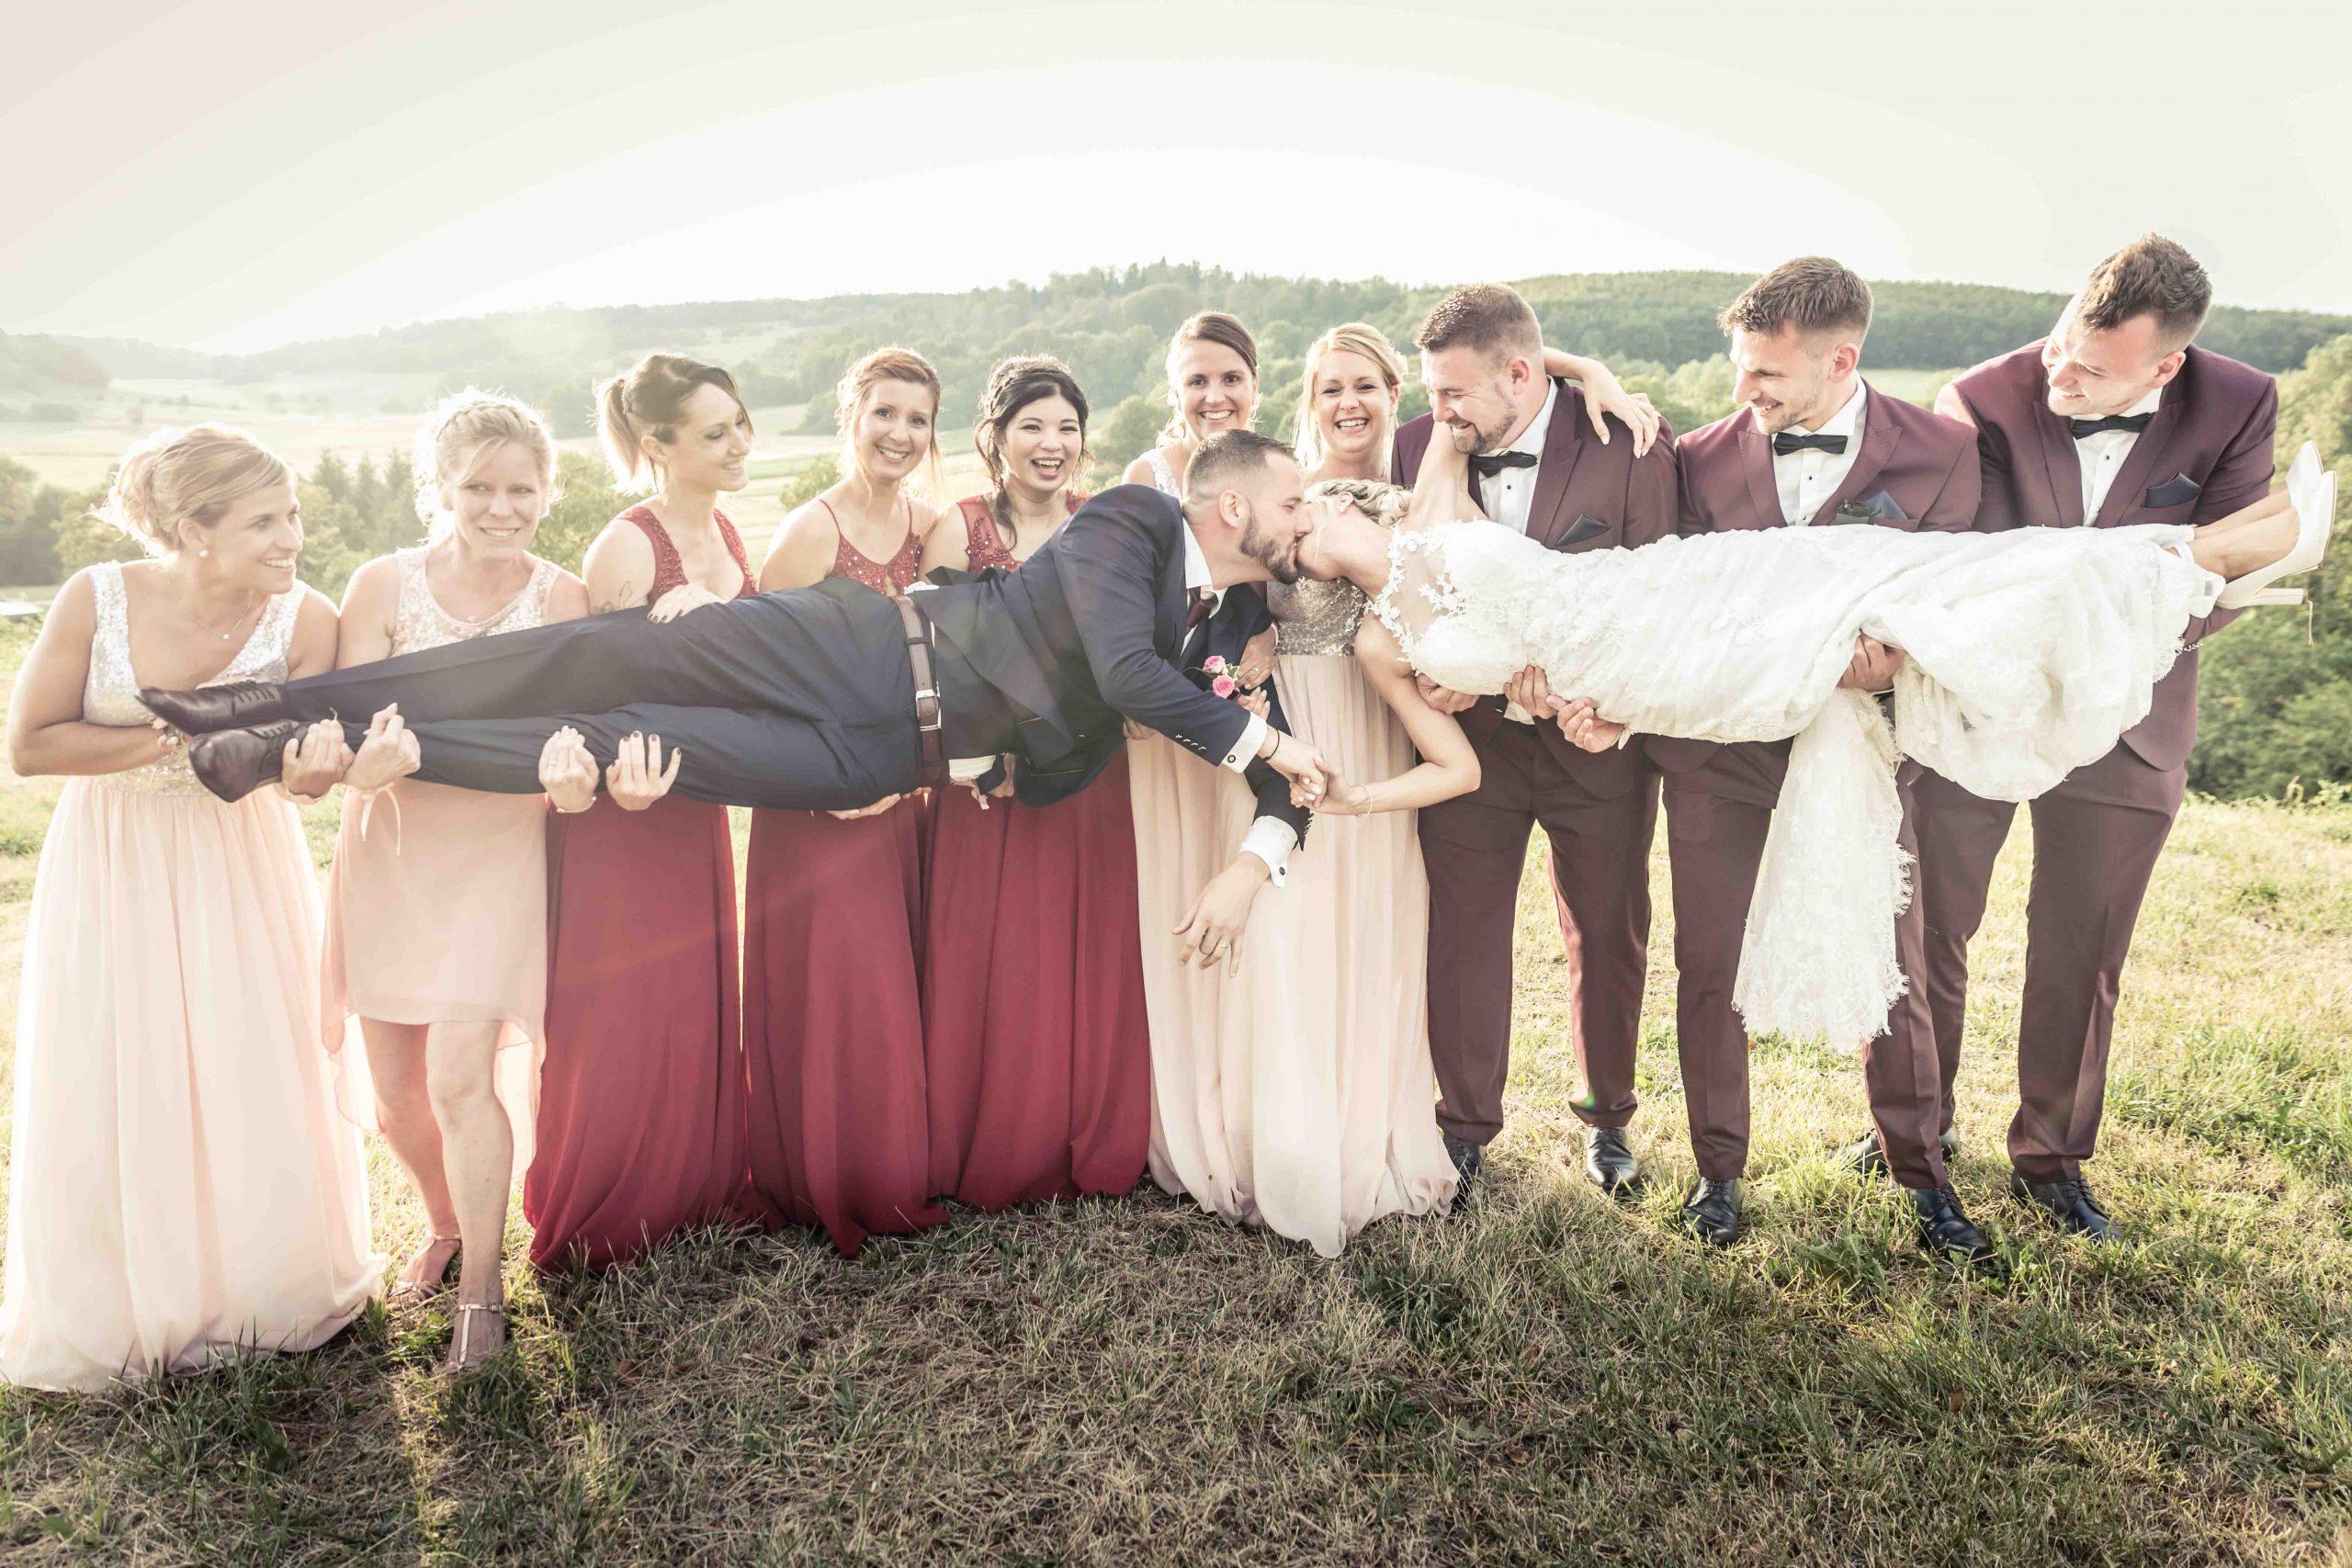 photo de groupe originale dan sun mariage dan sle Sundgau à Winkcel avec la société d'organisation de mariage 2A event